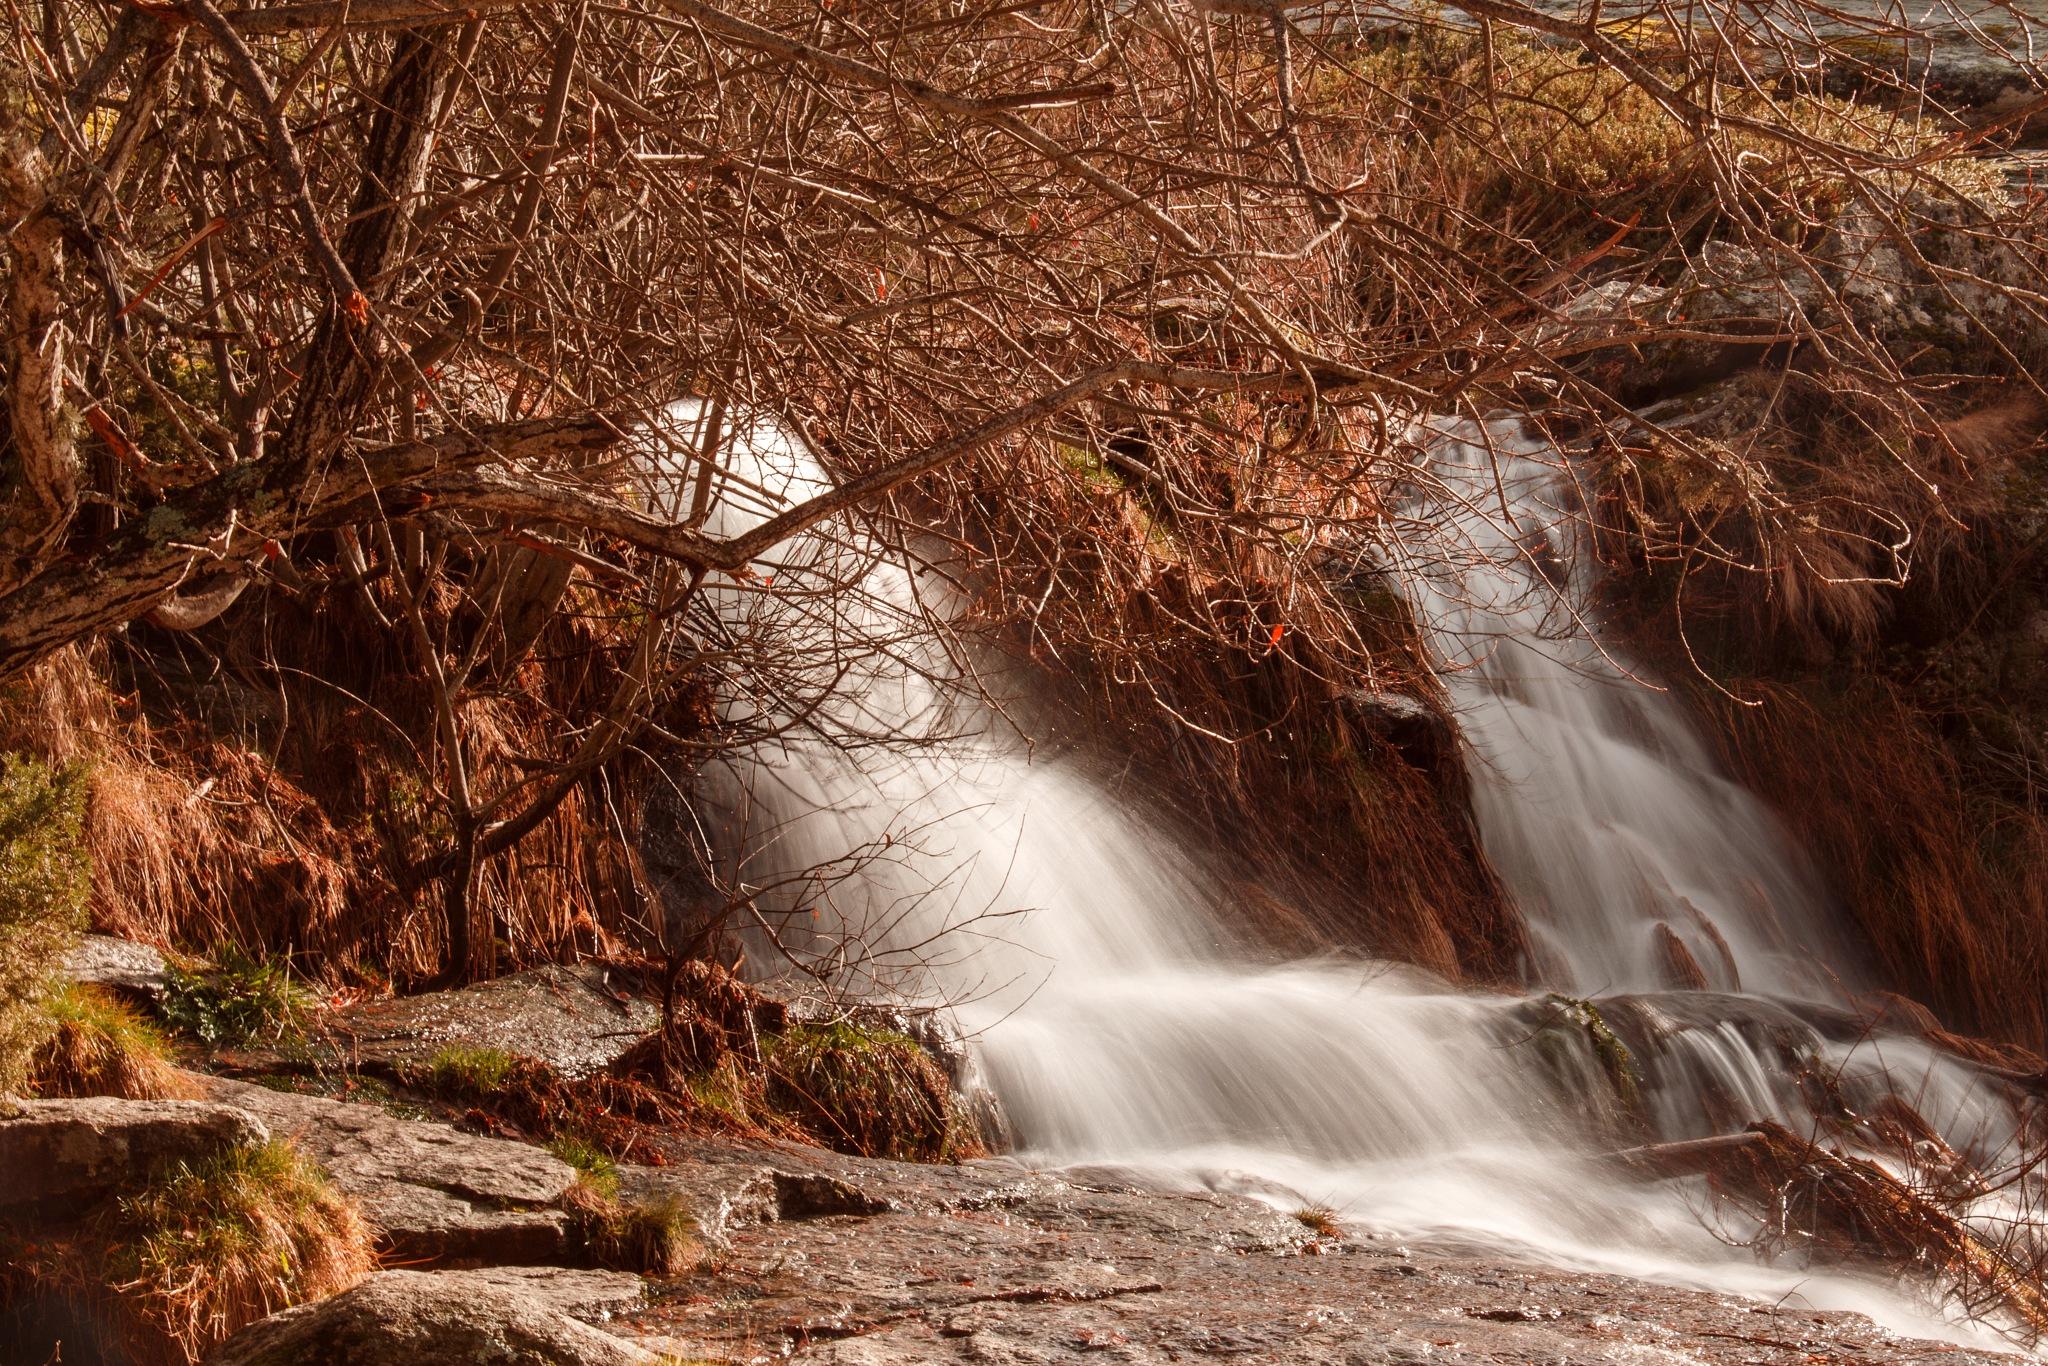 Cascada by Luisbaneres